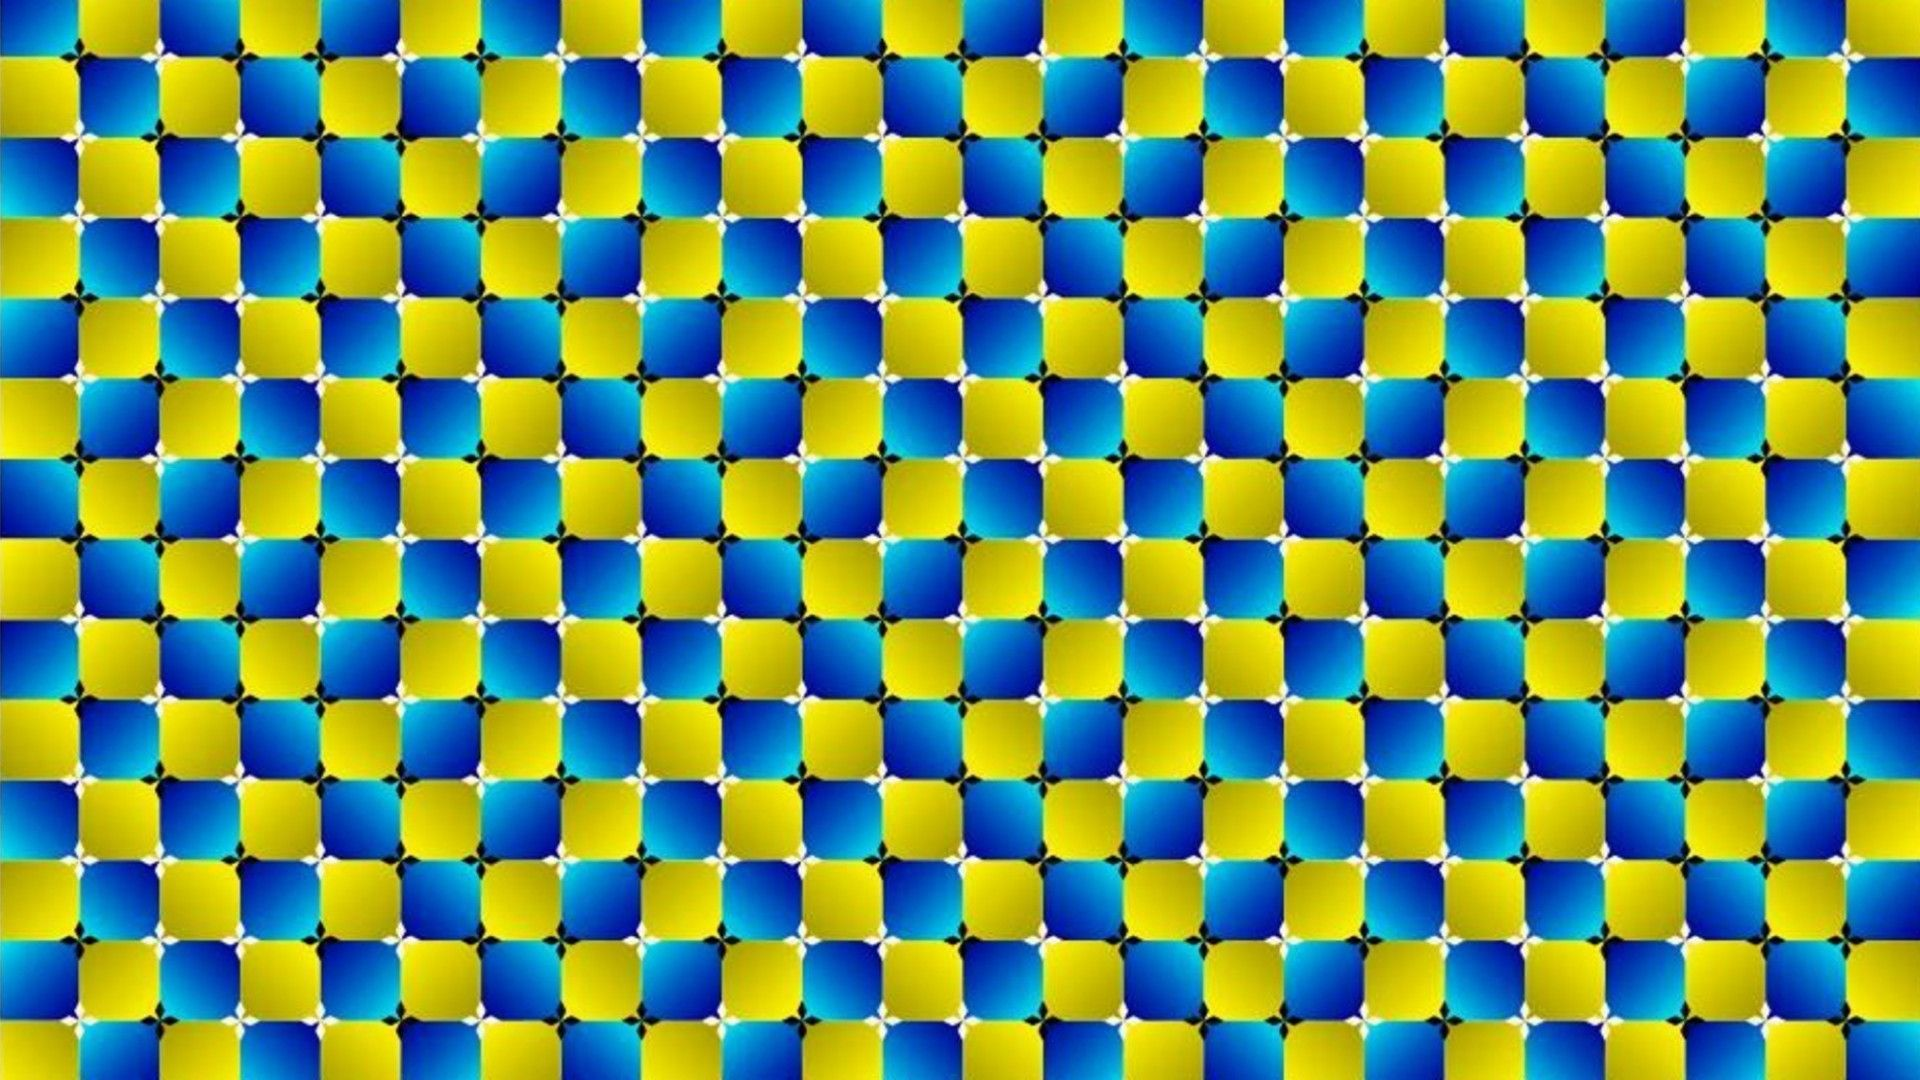 Optical Illusions - Google Search